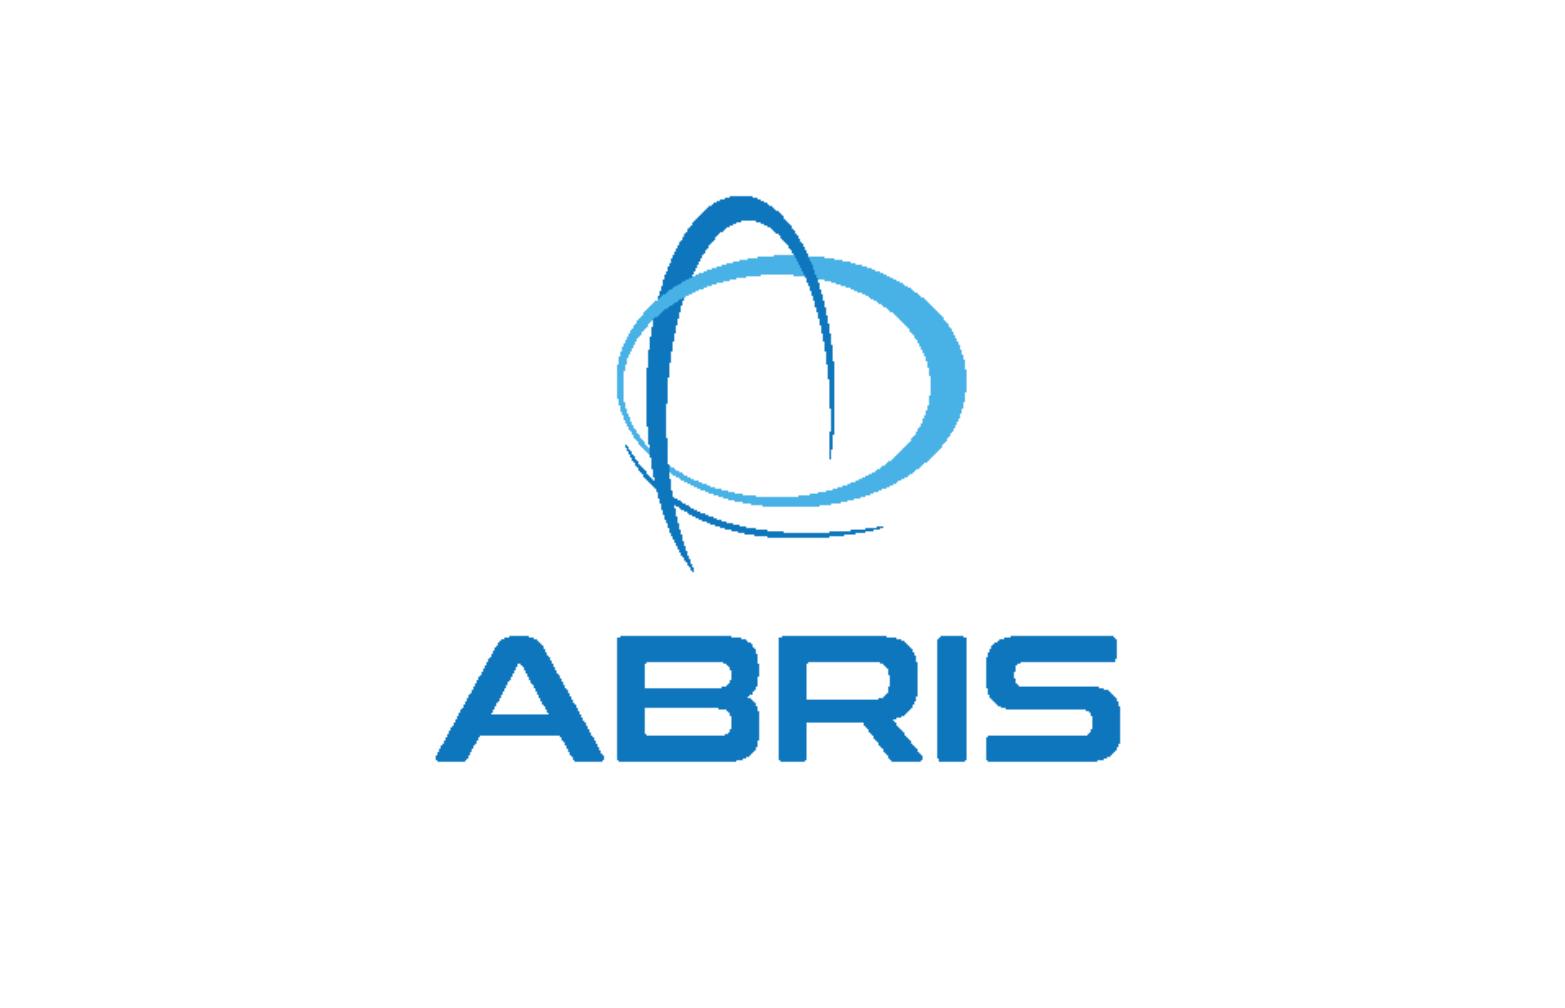 ABRIS DISTRIBUTION INC